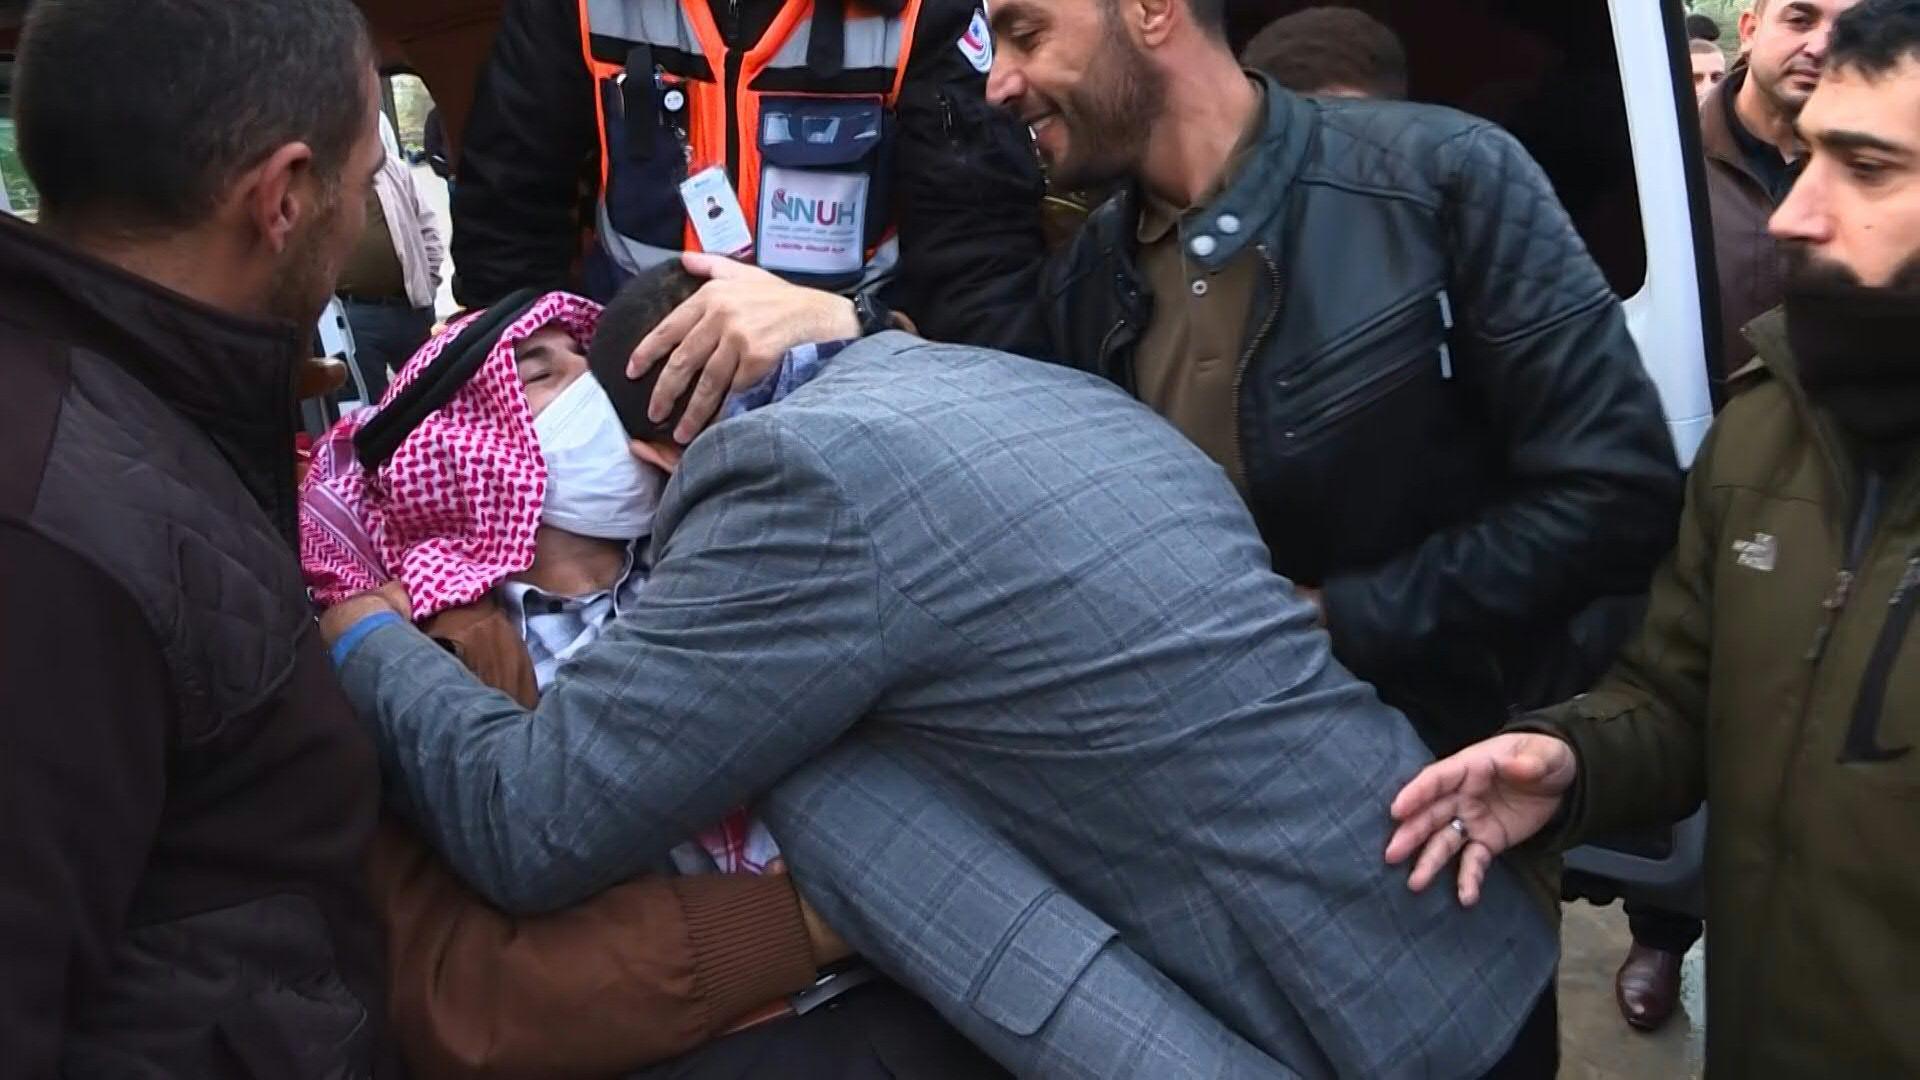 uk.news.yahoo.com: Israel frees Palestinian who waged 103-day hunger strike